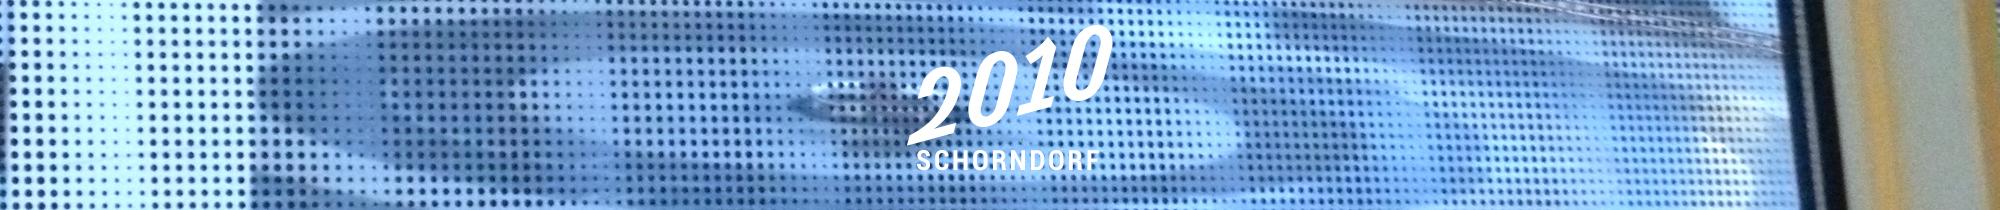 2010-schorndorf-slidi-01